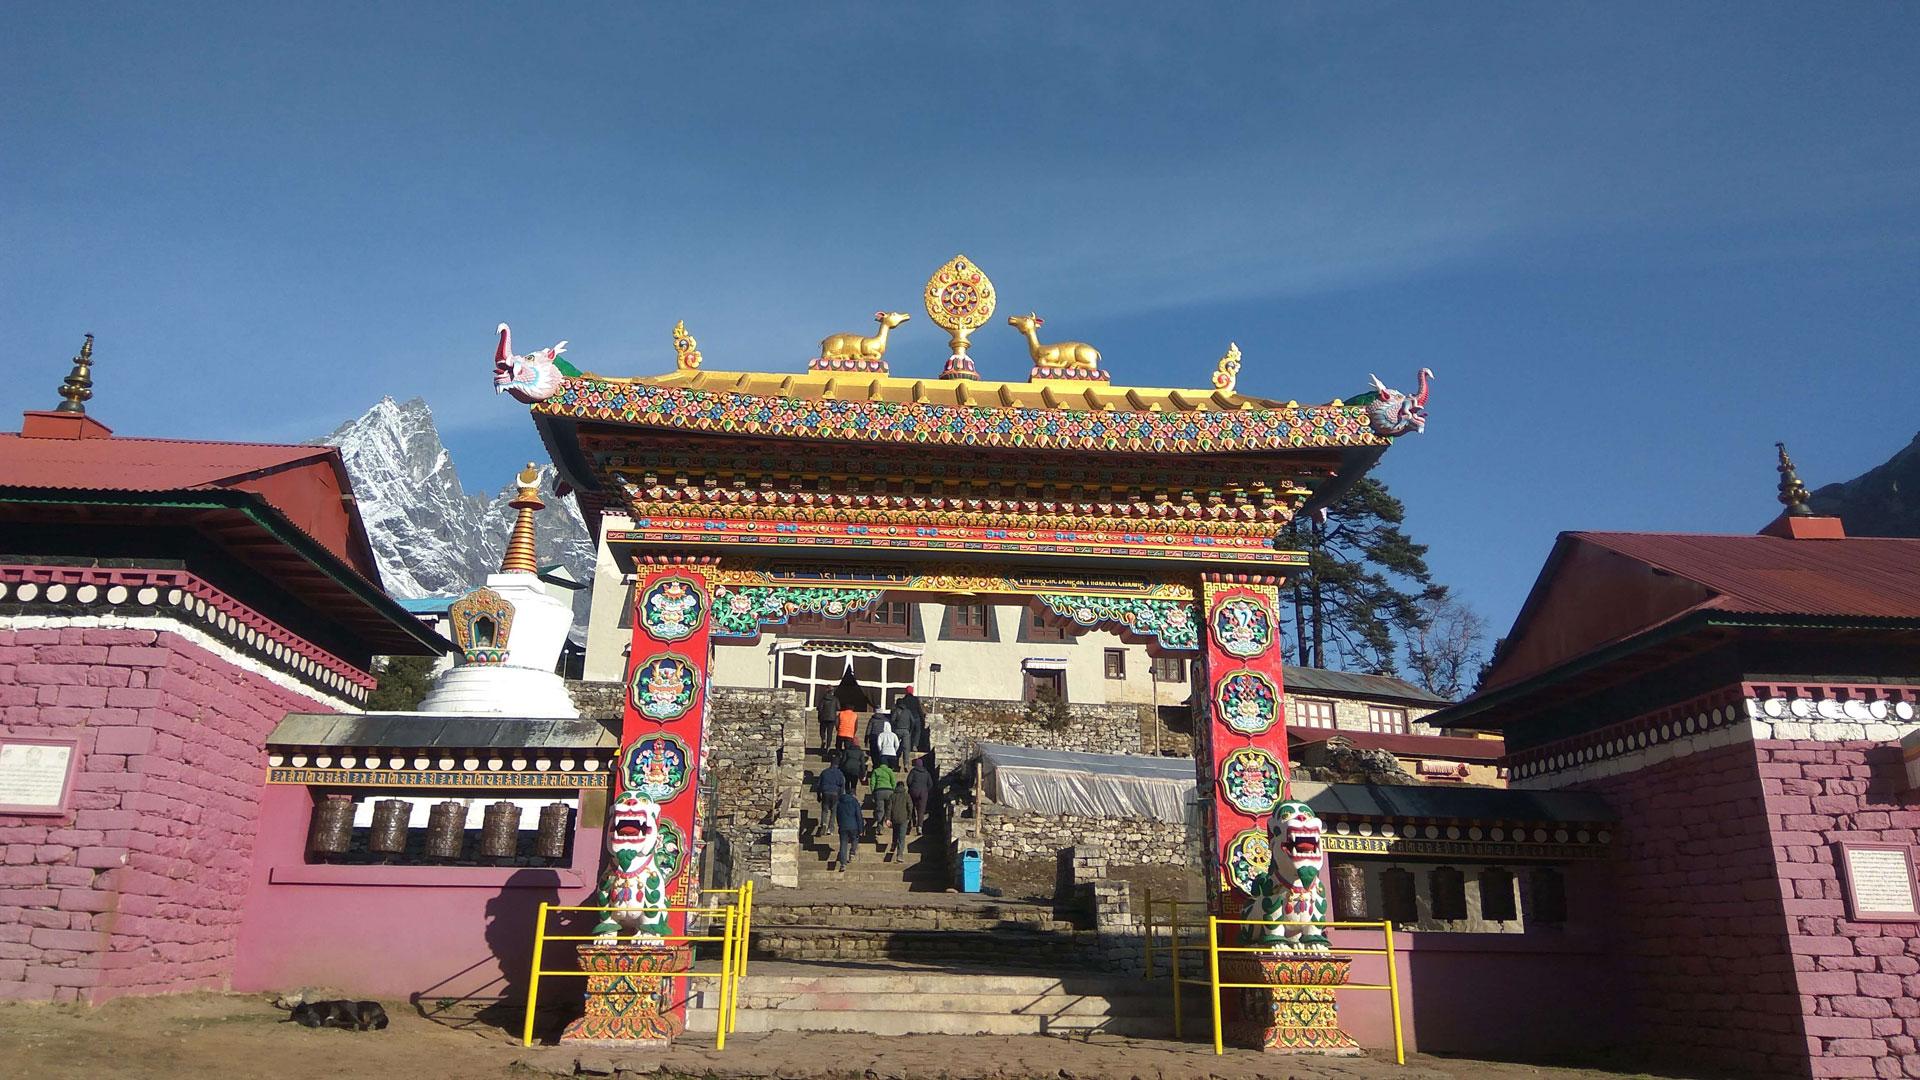 Entrance gate of Tengboche Monastery